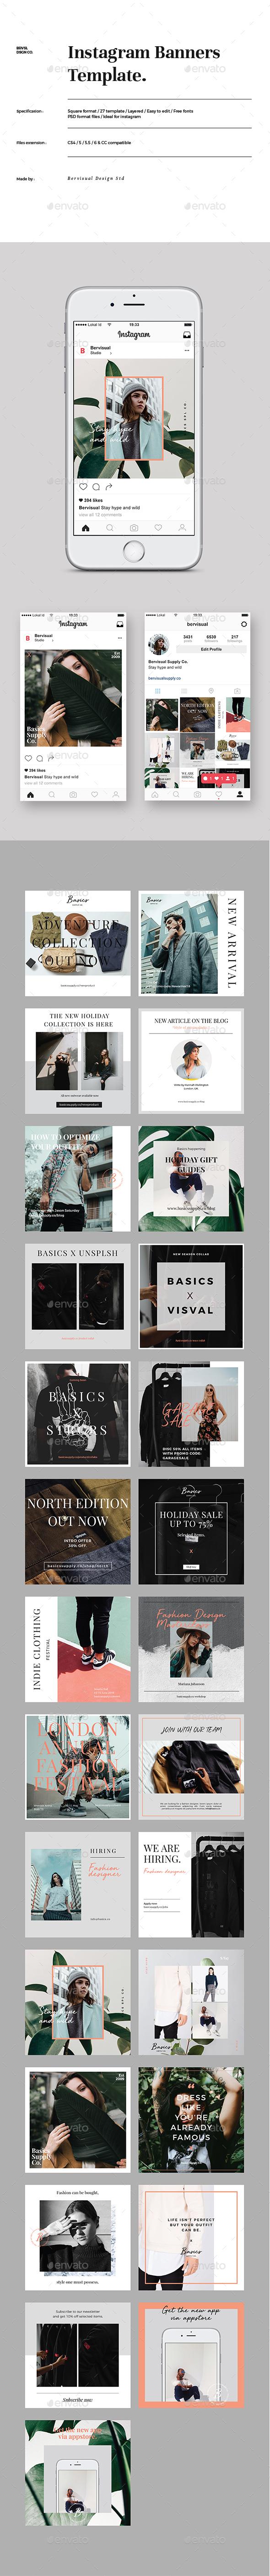 Fashion Instagram Banner Template - Social Media Web Elements